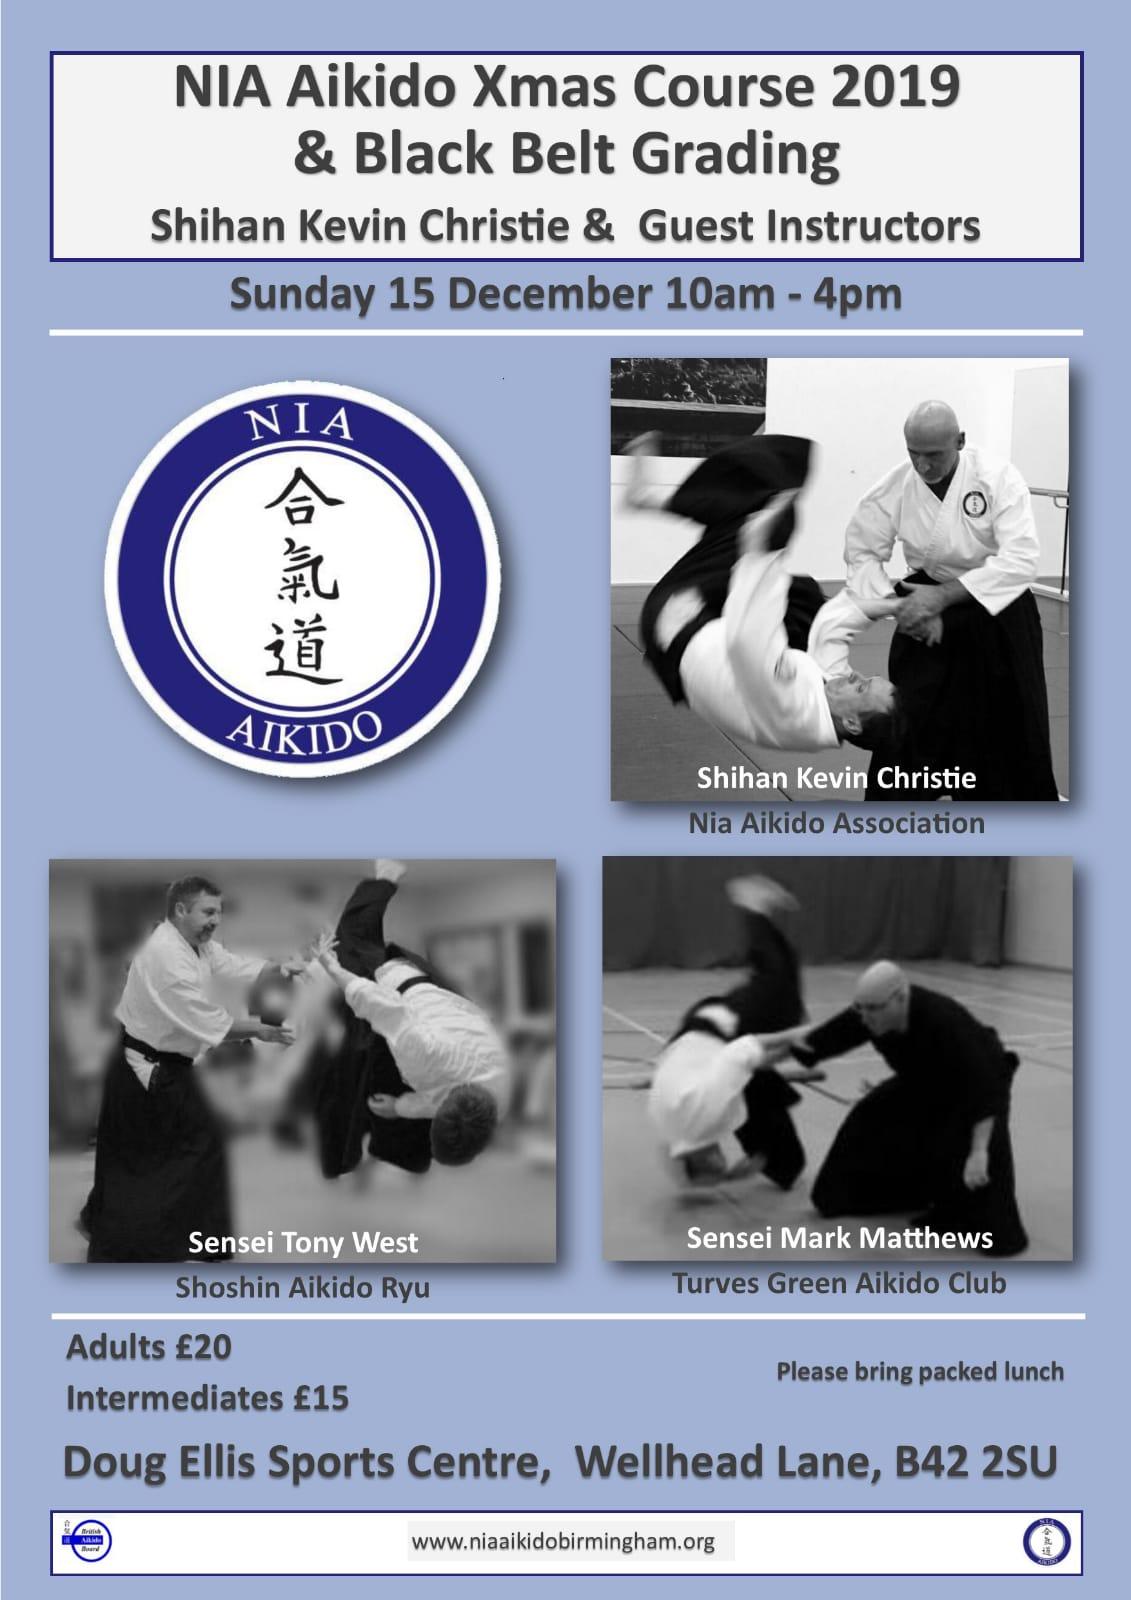 NIA Aikido Xmas Course 2019